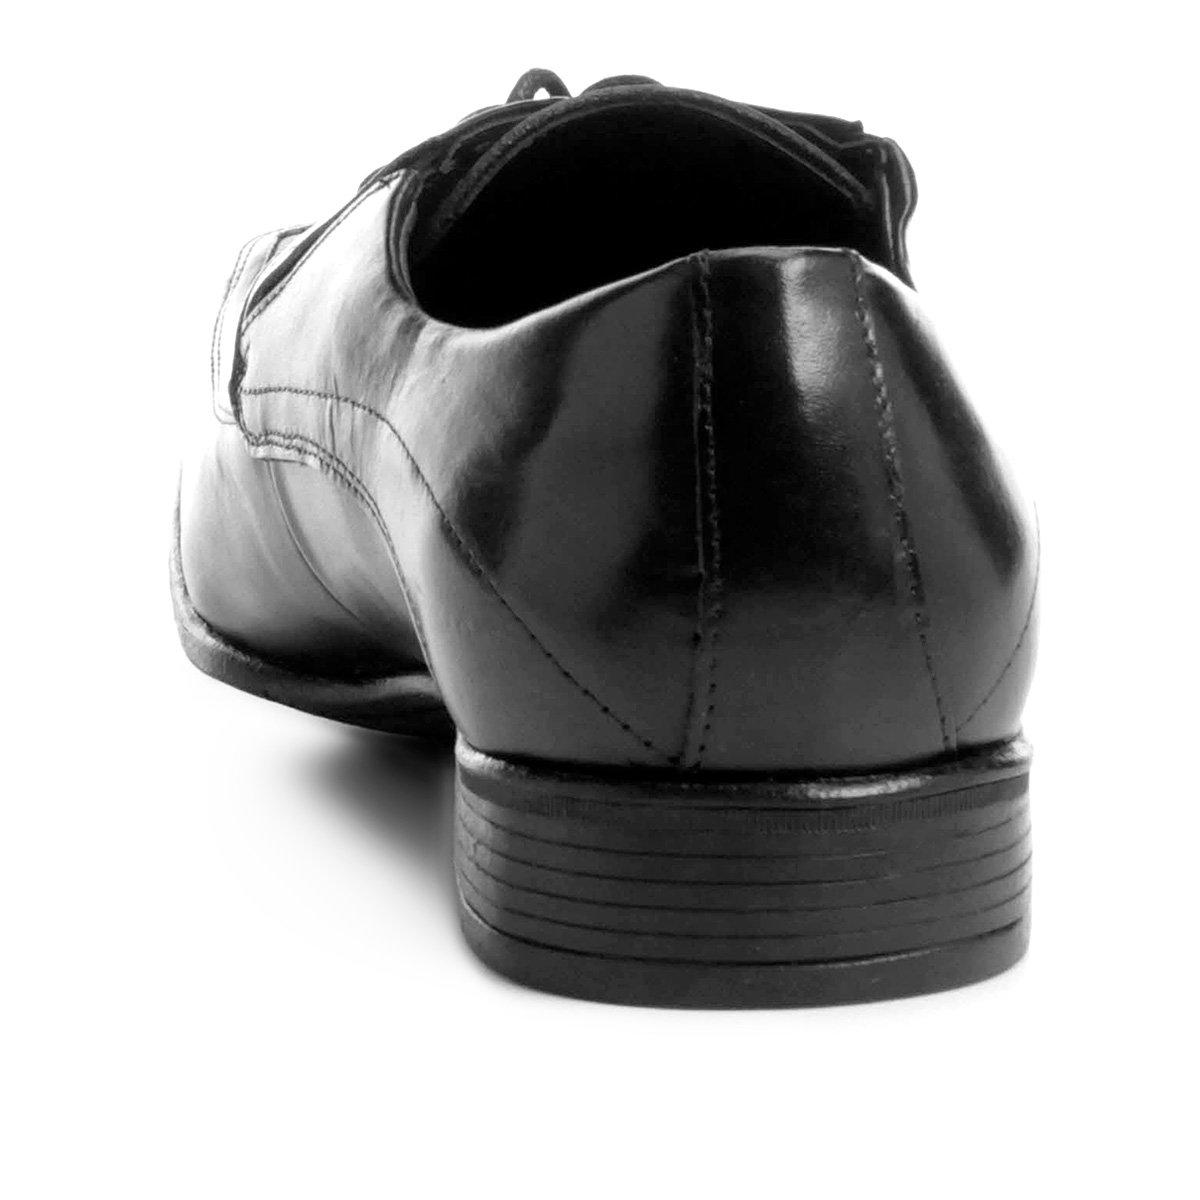 Sapato Social Sapato Couro Shoestock Shoestock Preto Social Quadrado Bico Couro Bico HqwrBRH